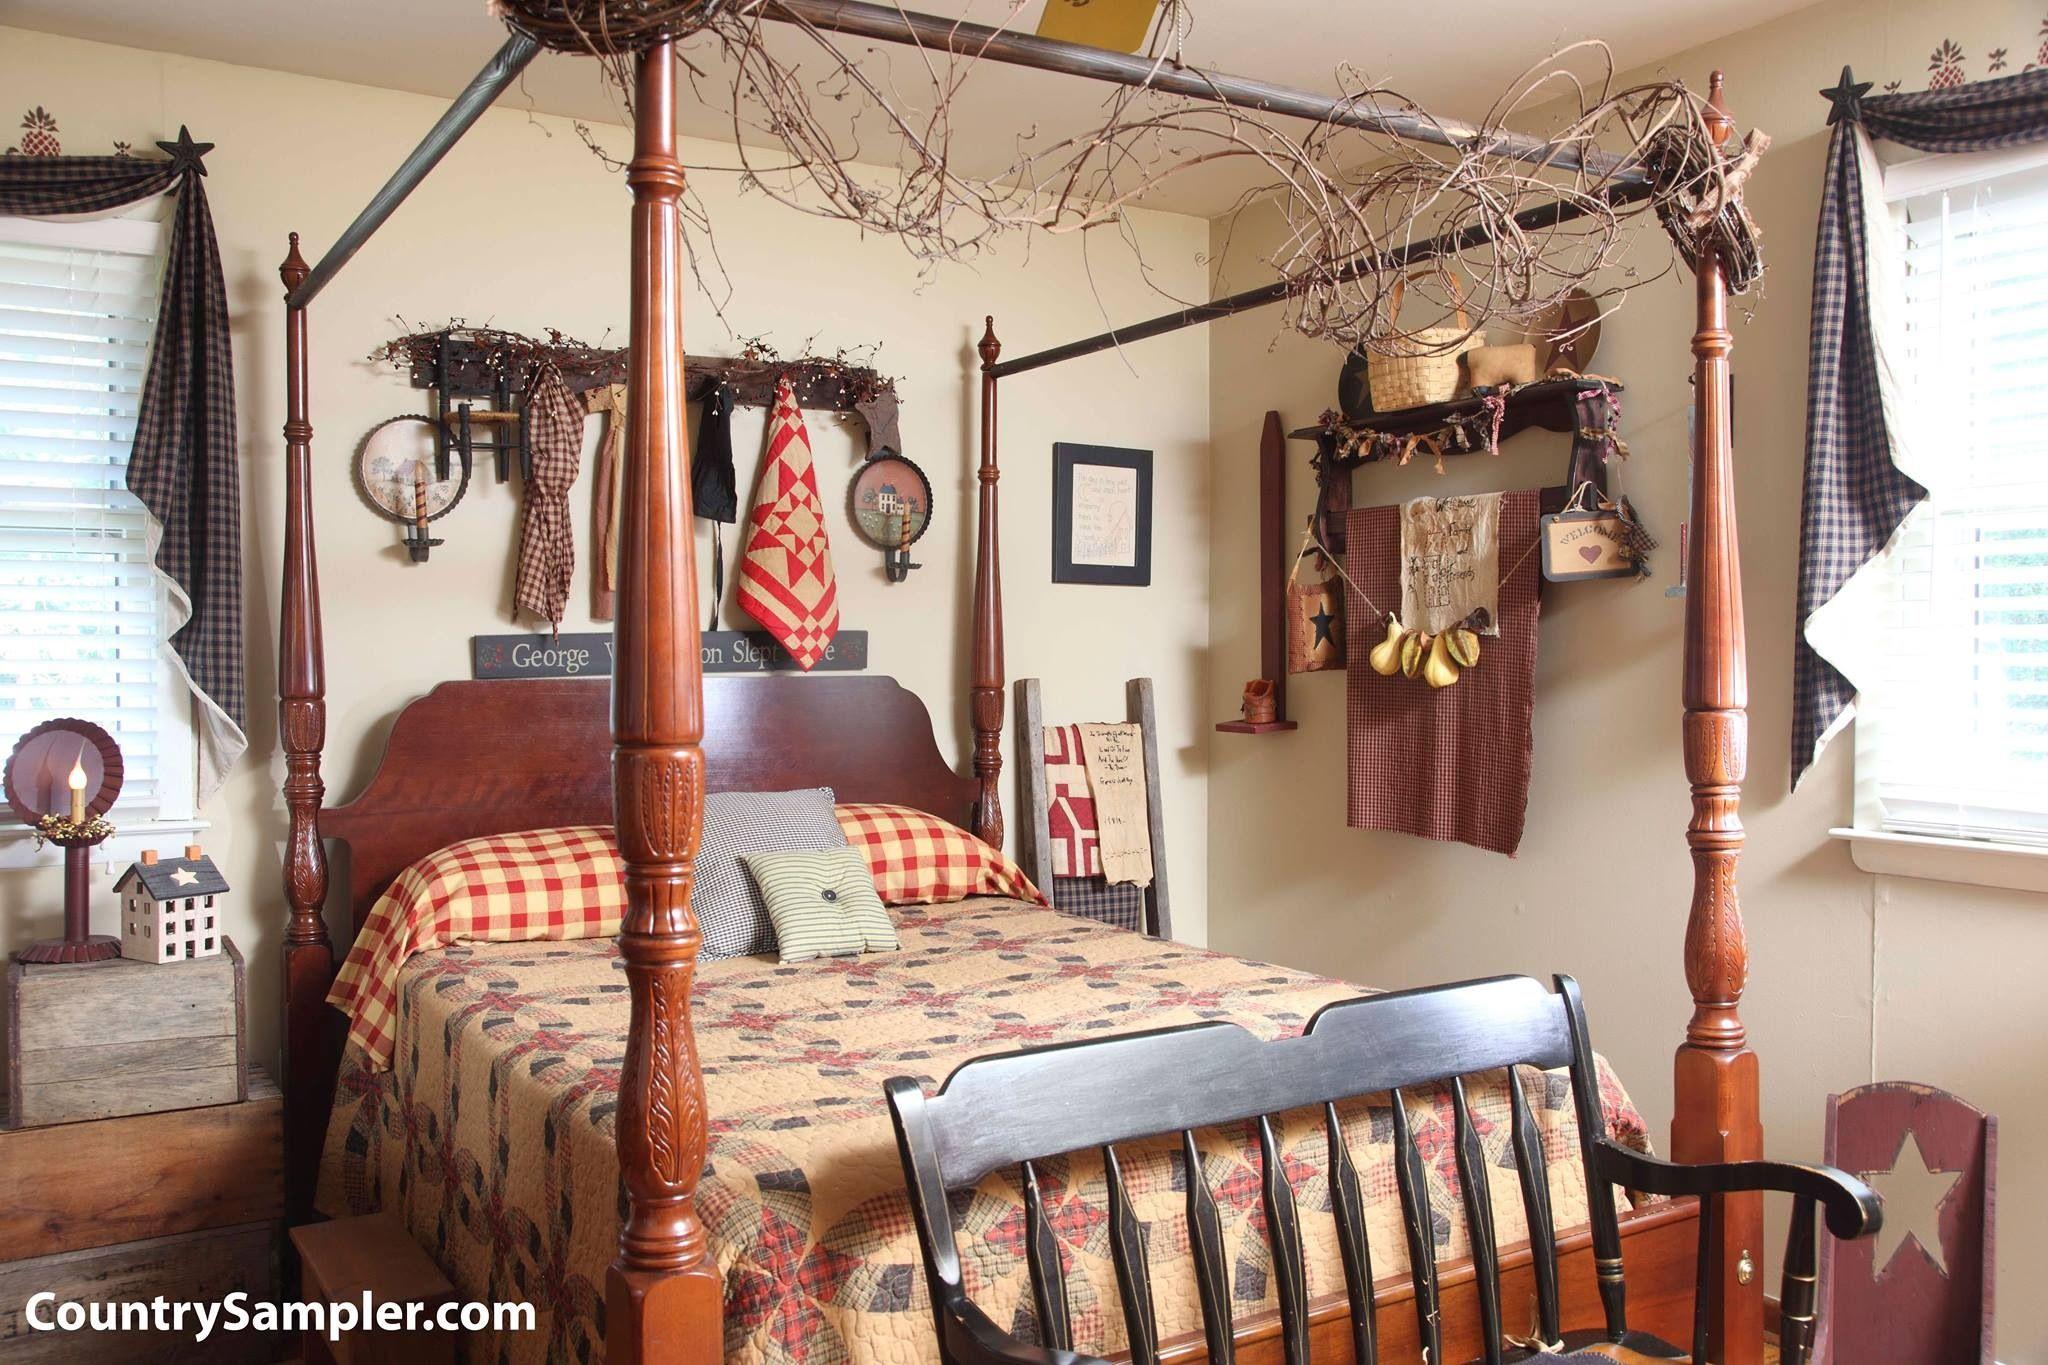 Country Sampler Primitive country bedrooms, Primitive